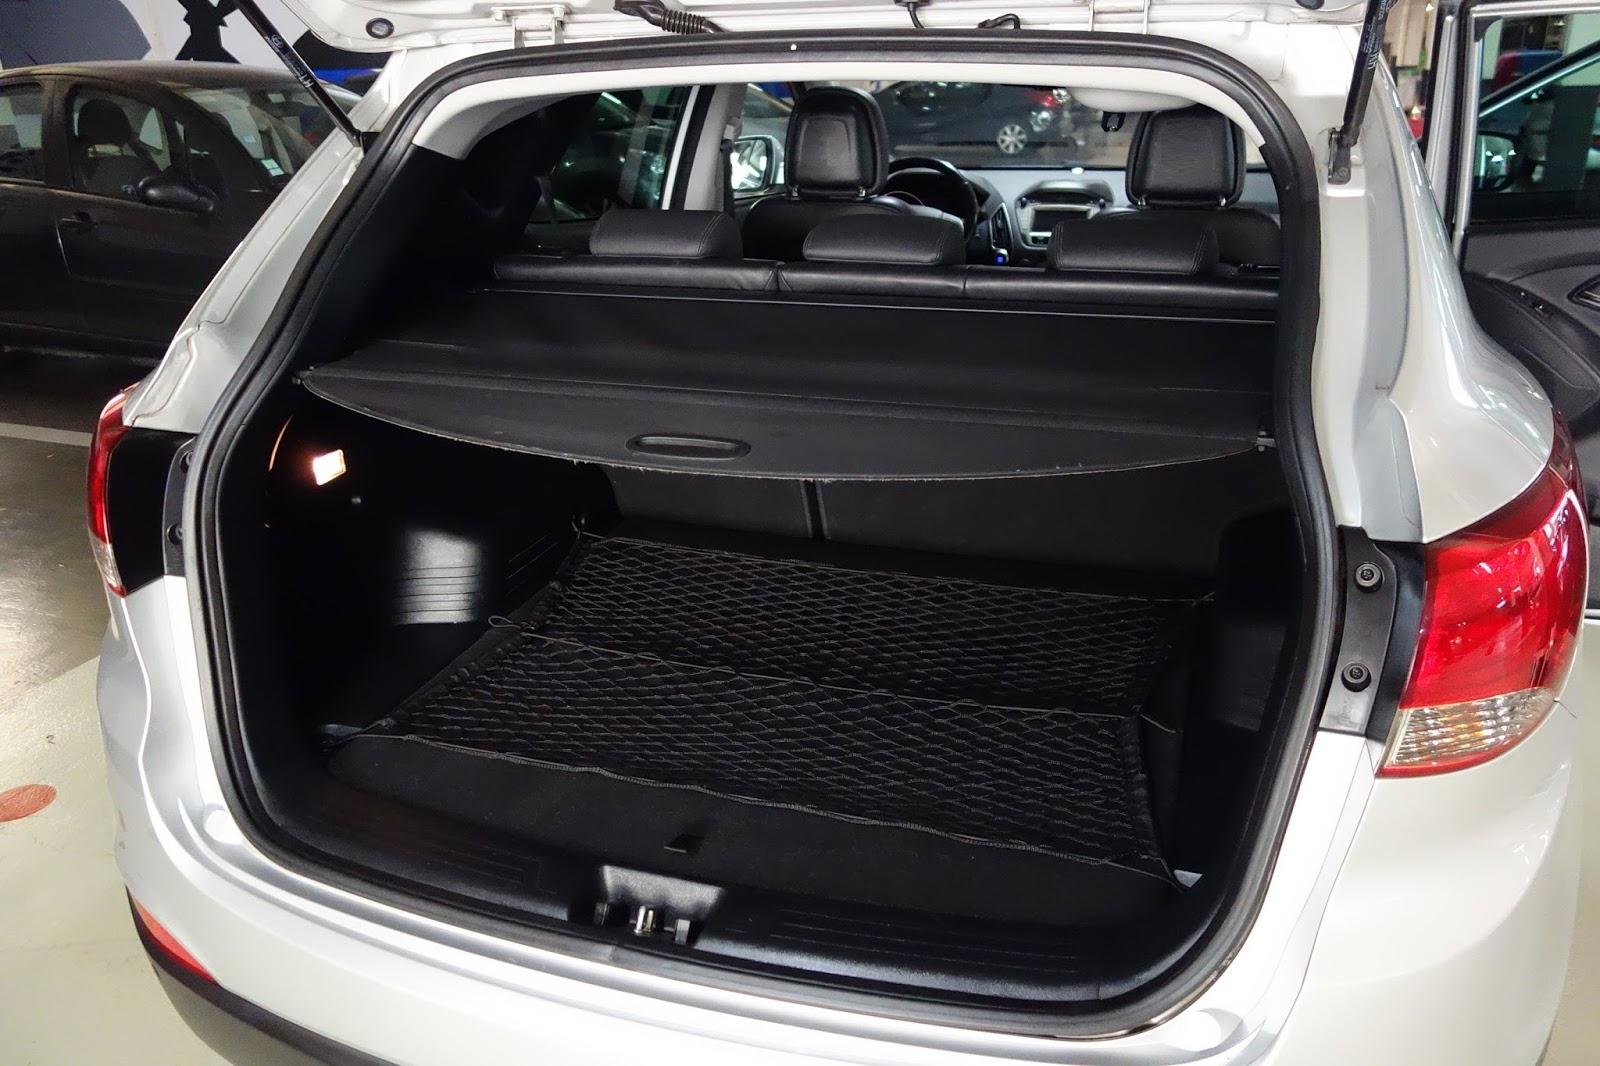 autocoach d p t vente automobile paris hyundai ix35 2 0 gdi 163 4wd executive 2010. Black Bedroom Furniture Sets. Home Design Ideas